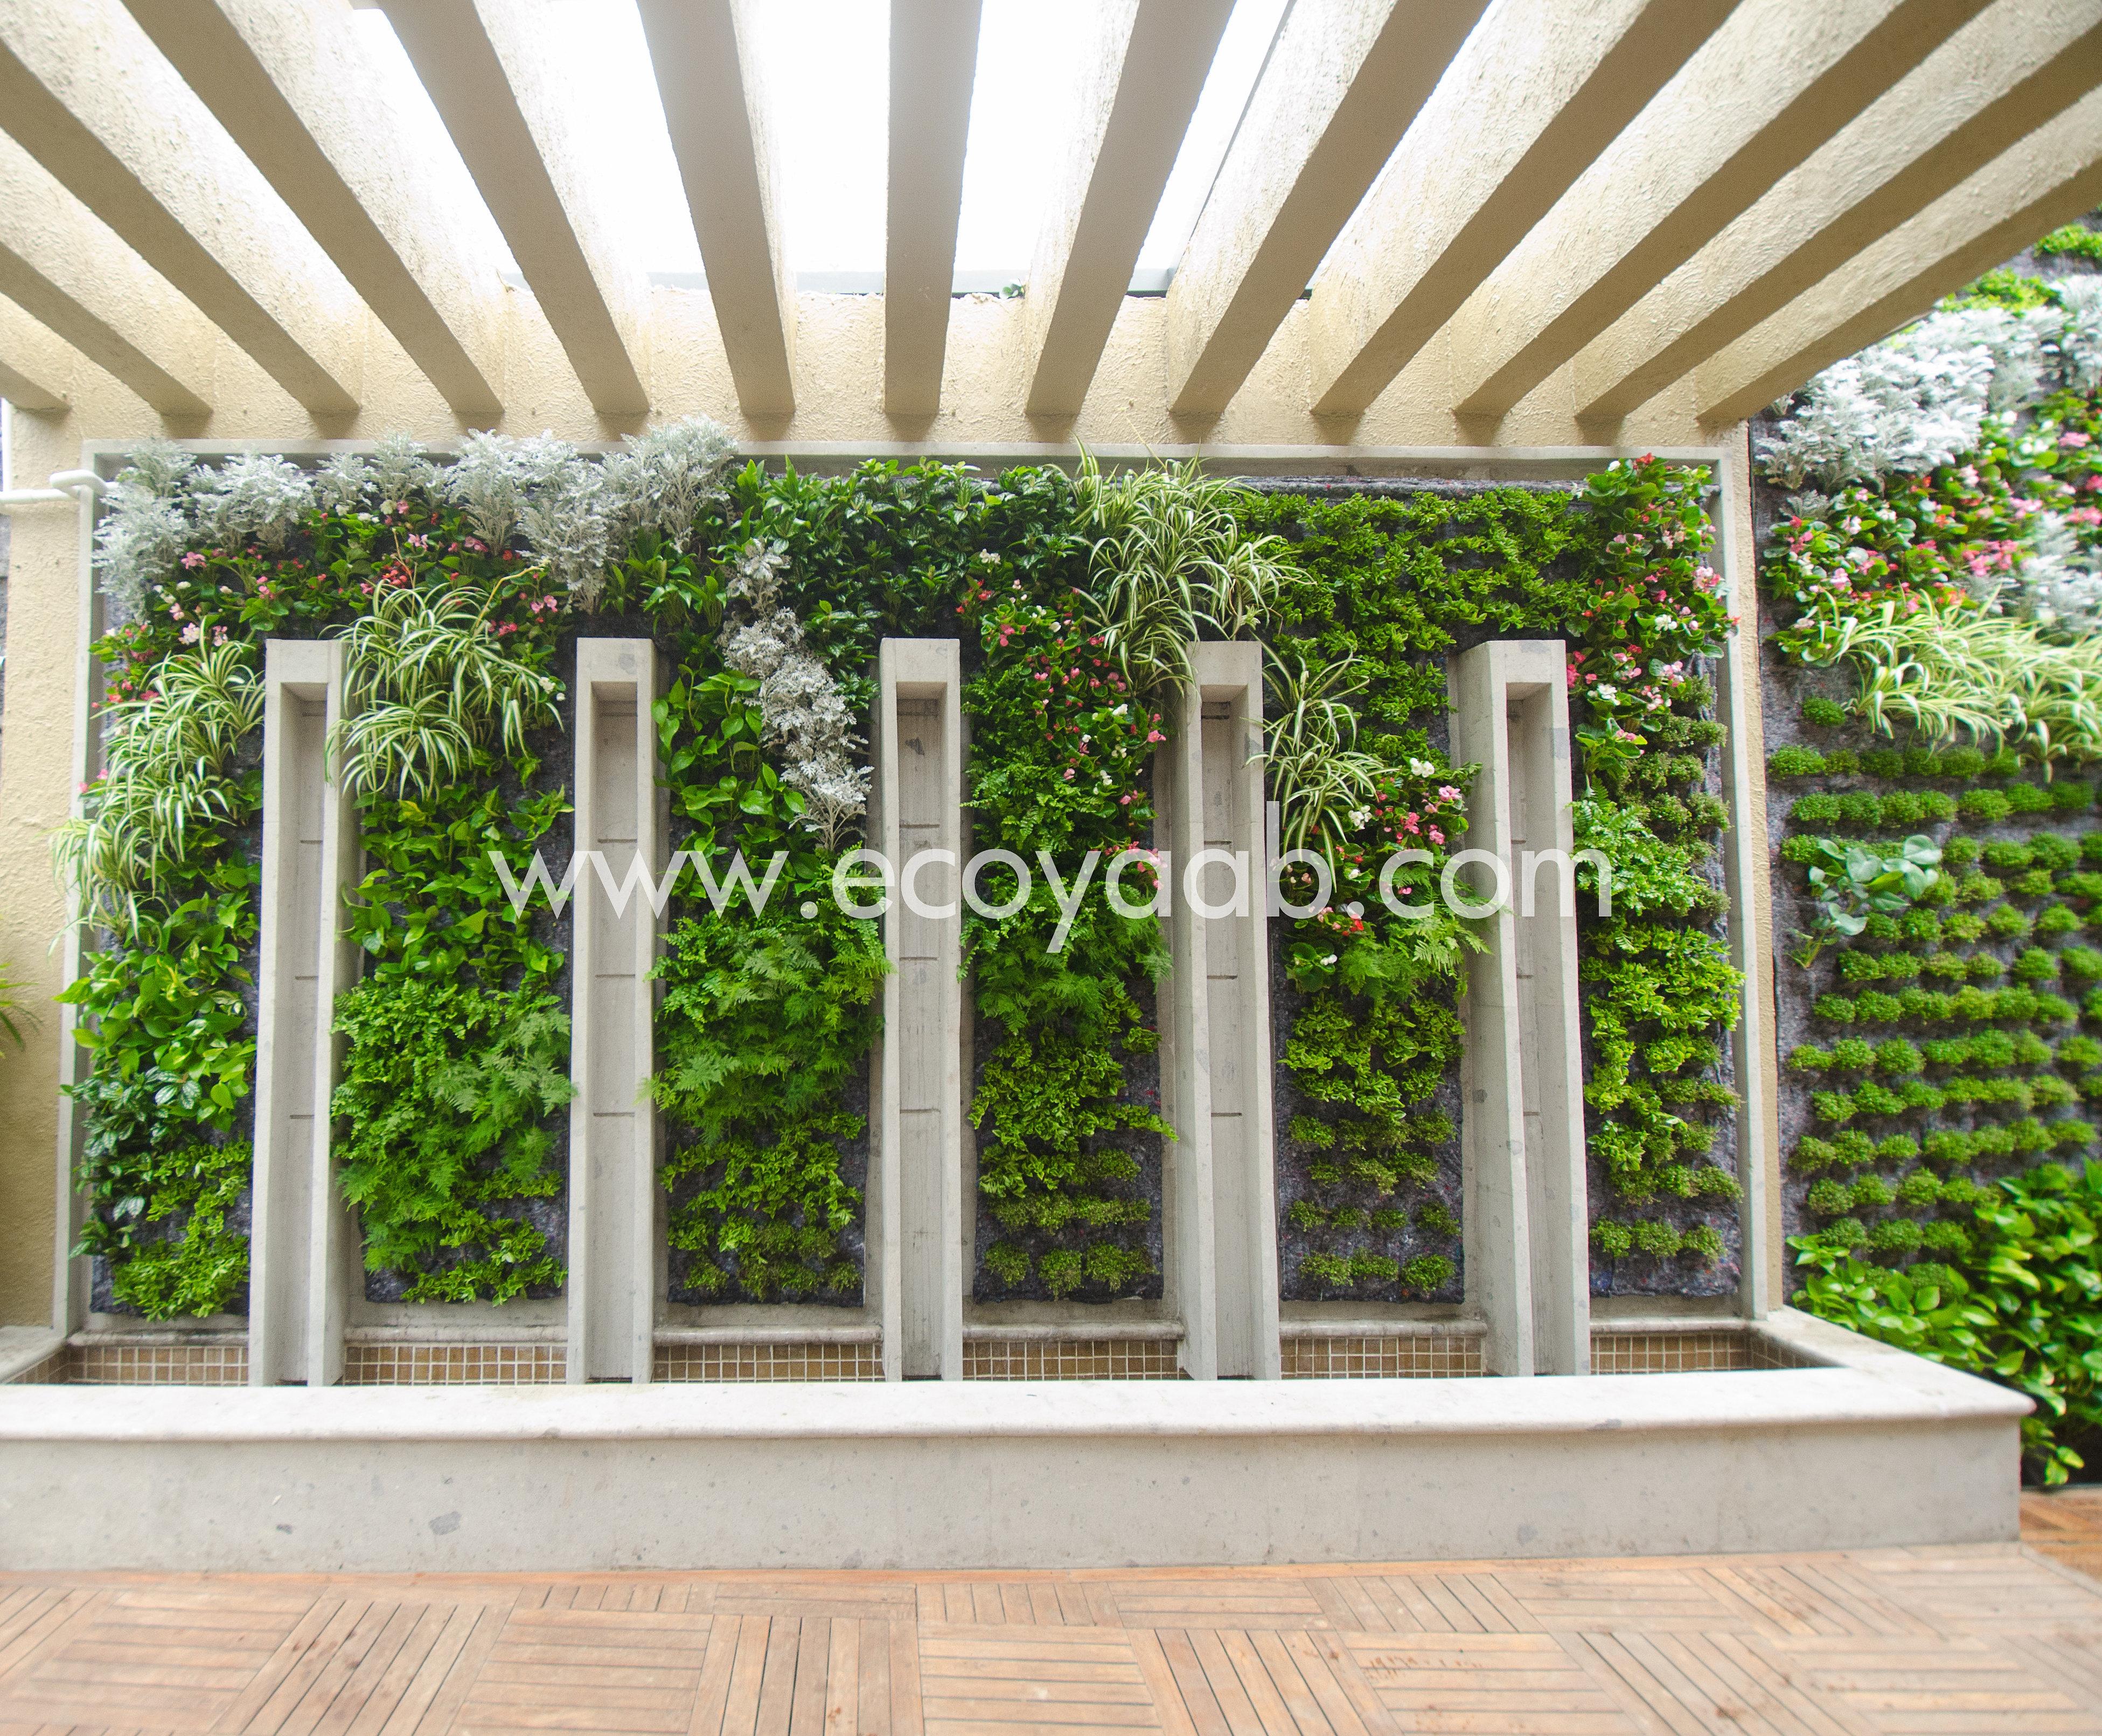 fachadas con jardines verticales On fachadas con jardines verticales